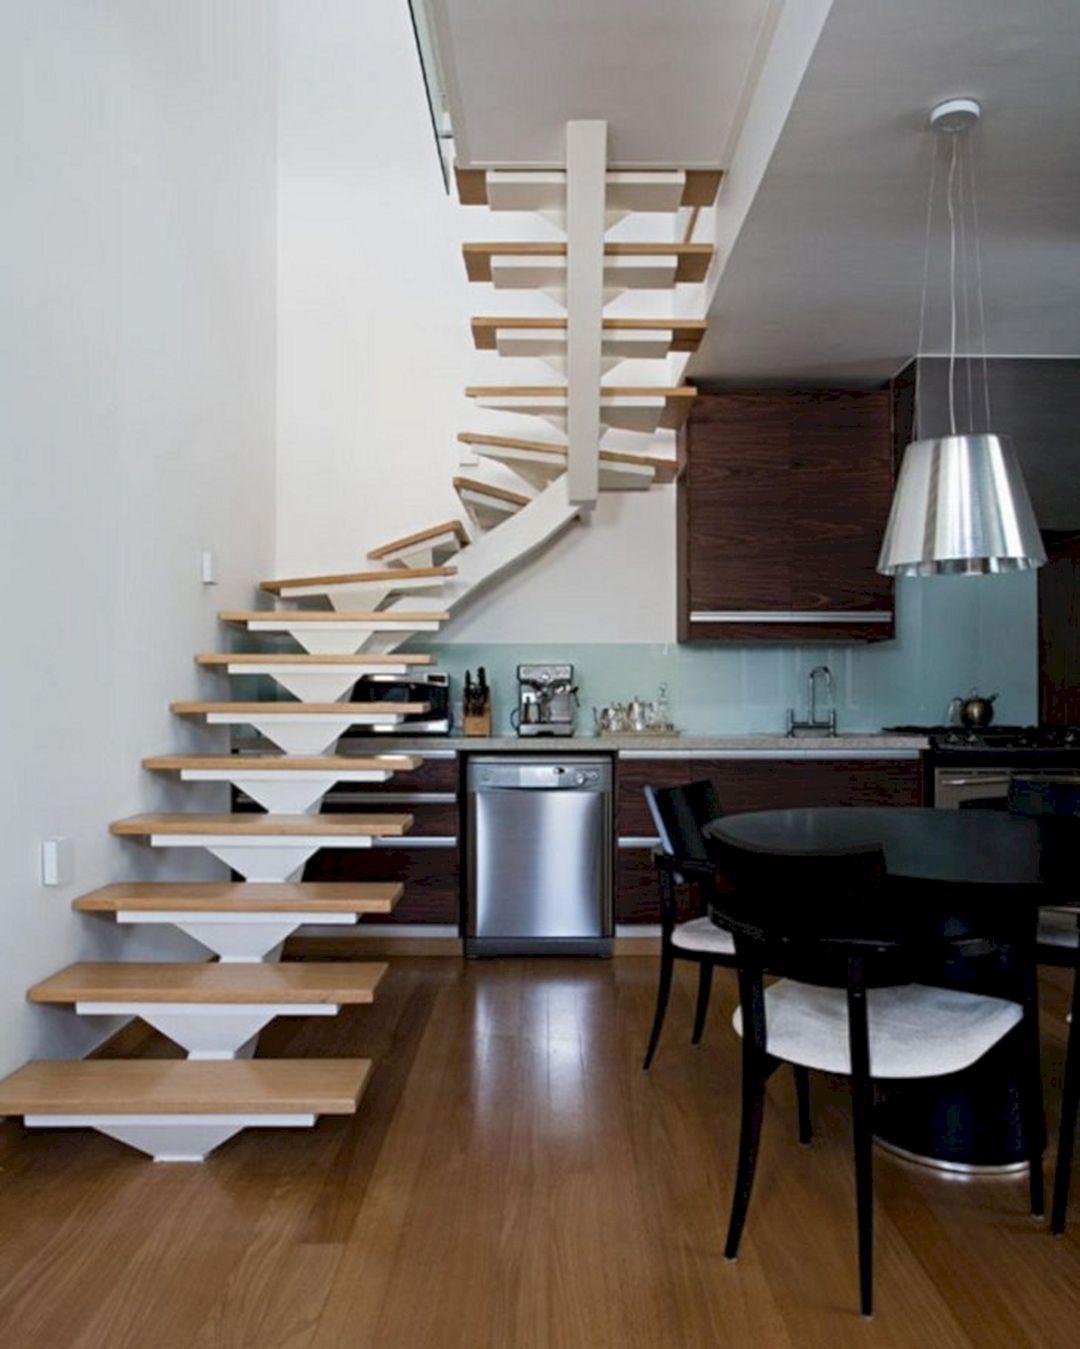 10 minimalist kitchen set design for under stairs you need to try freshouz com minimalist on kitchen under stairs id=61696